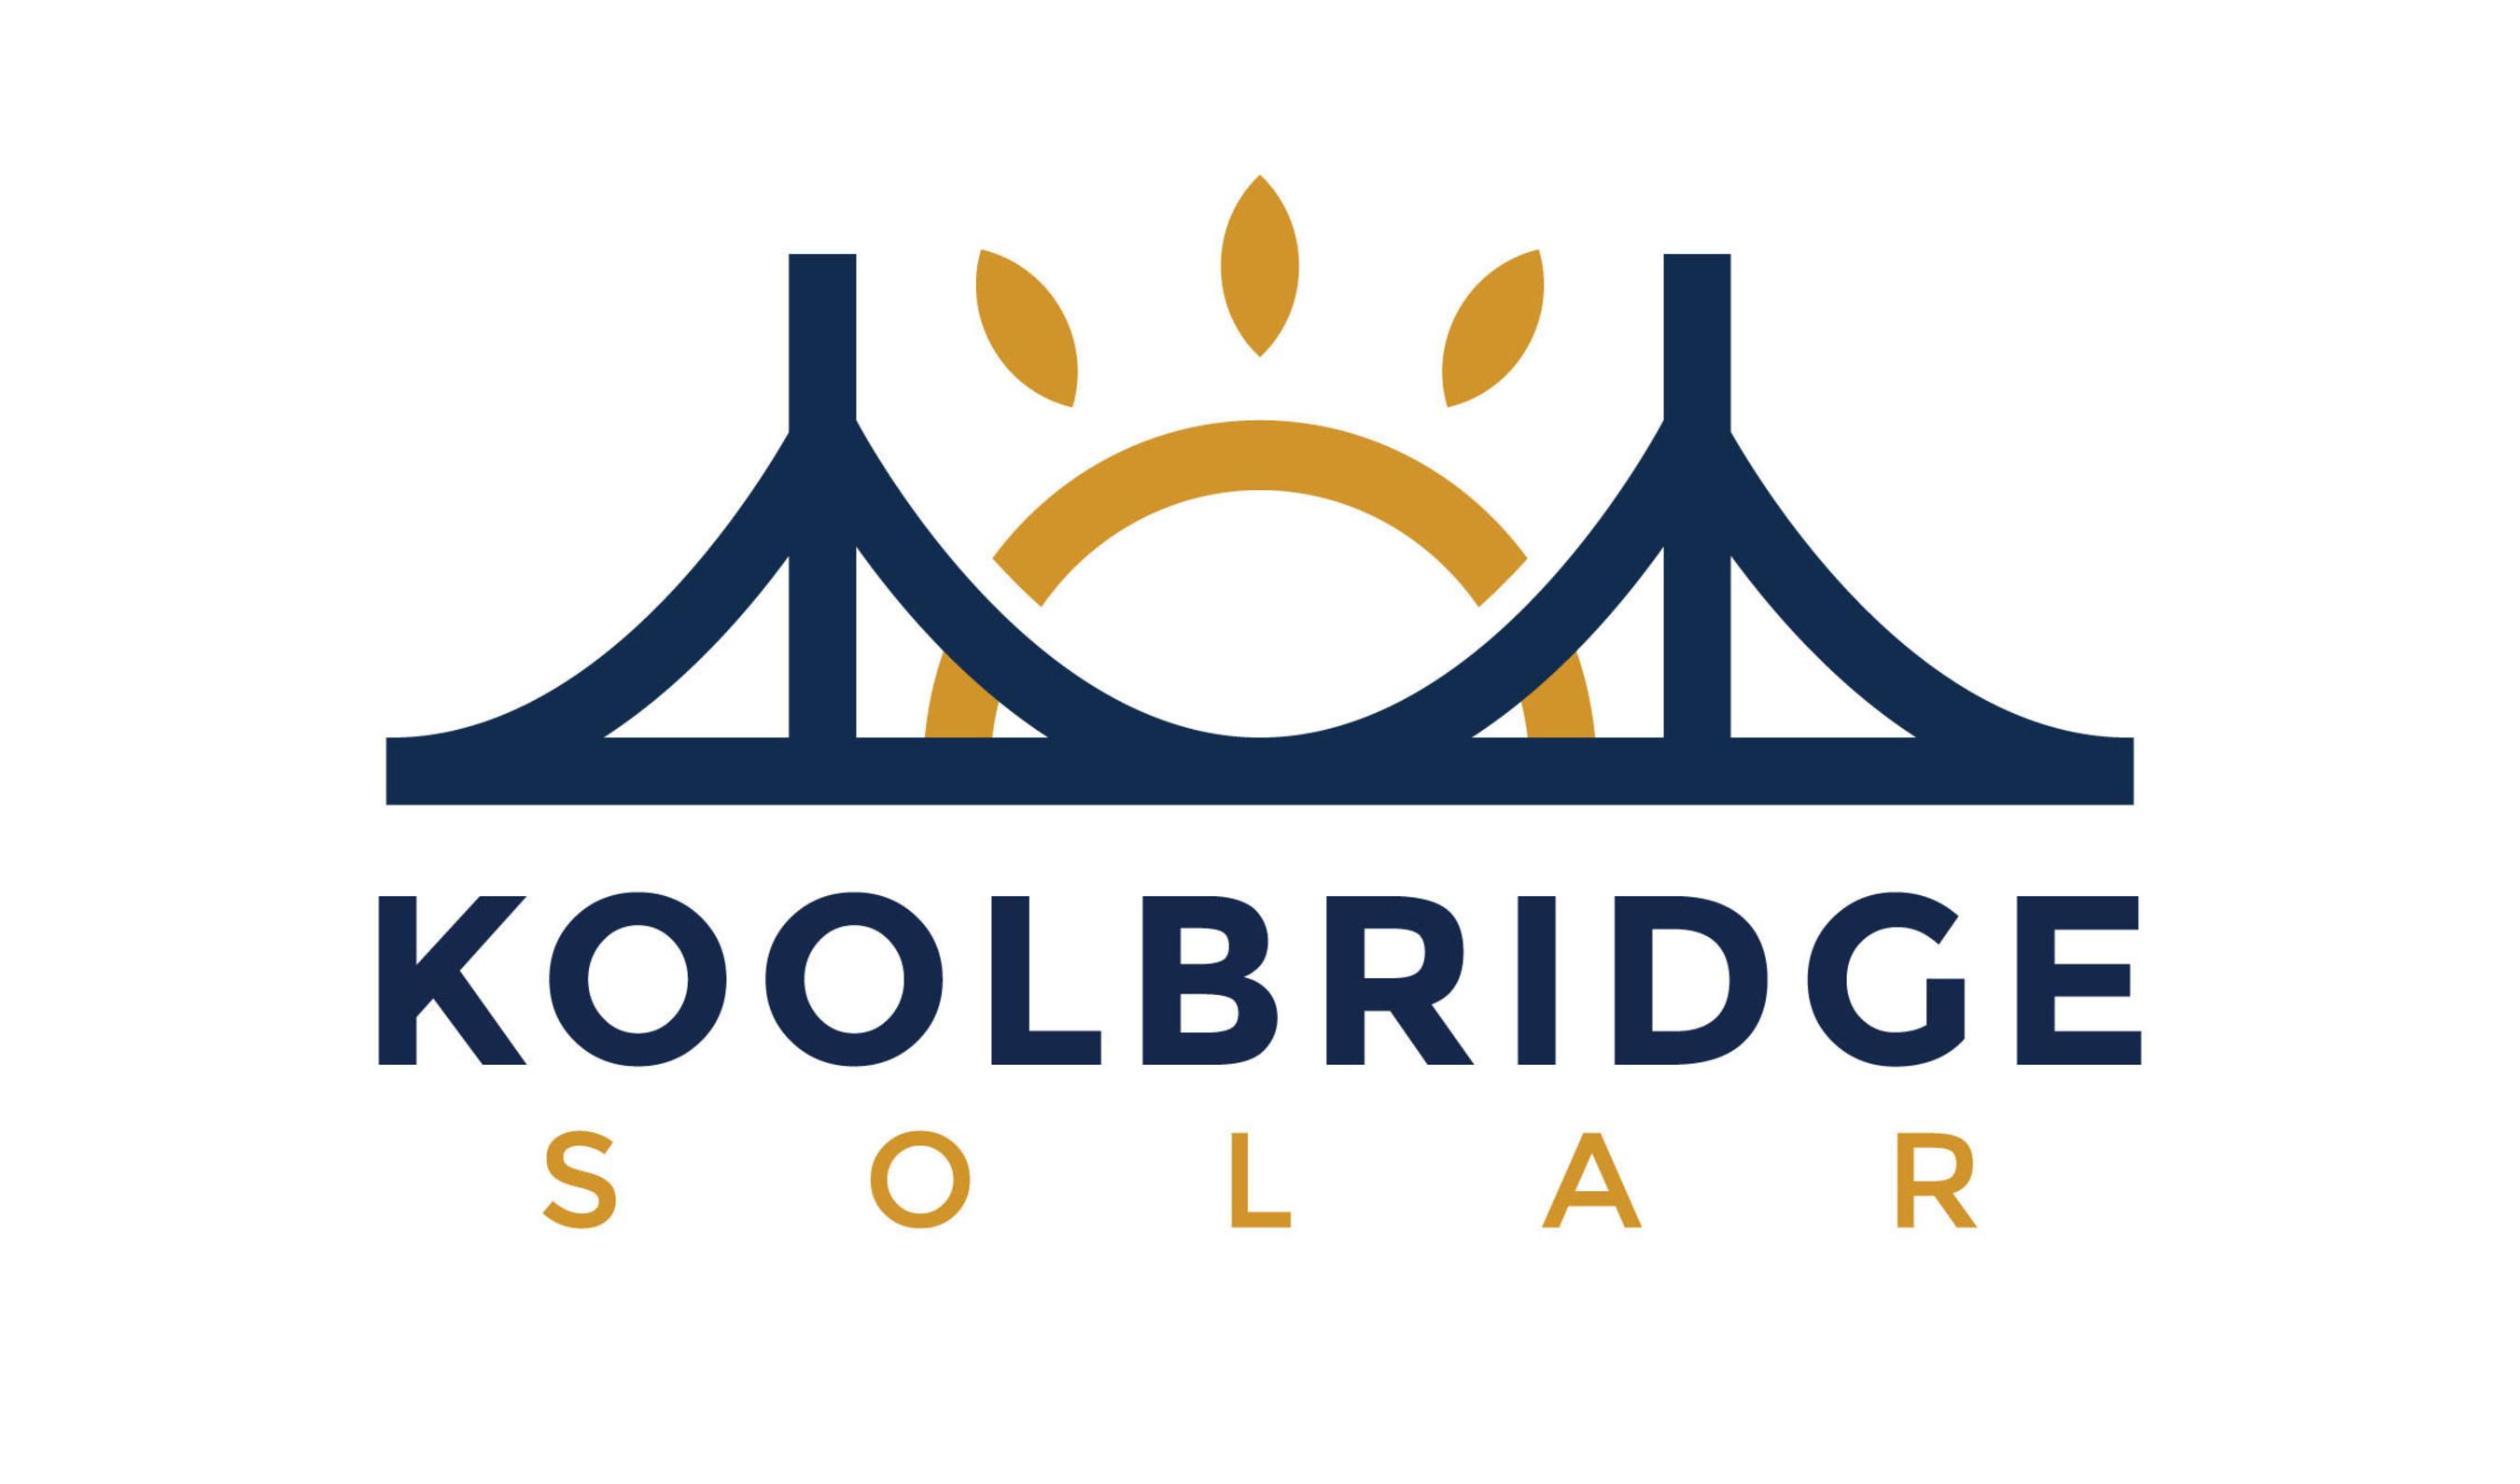 Koolbridge Solar Inc.